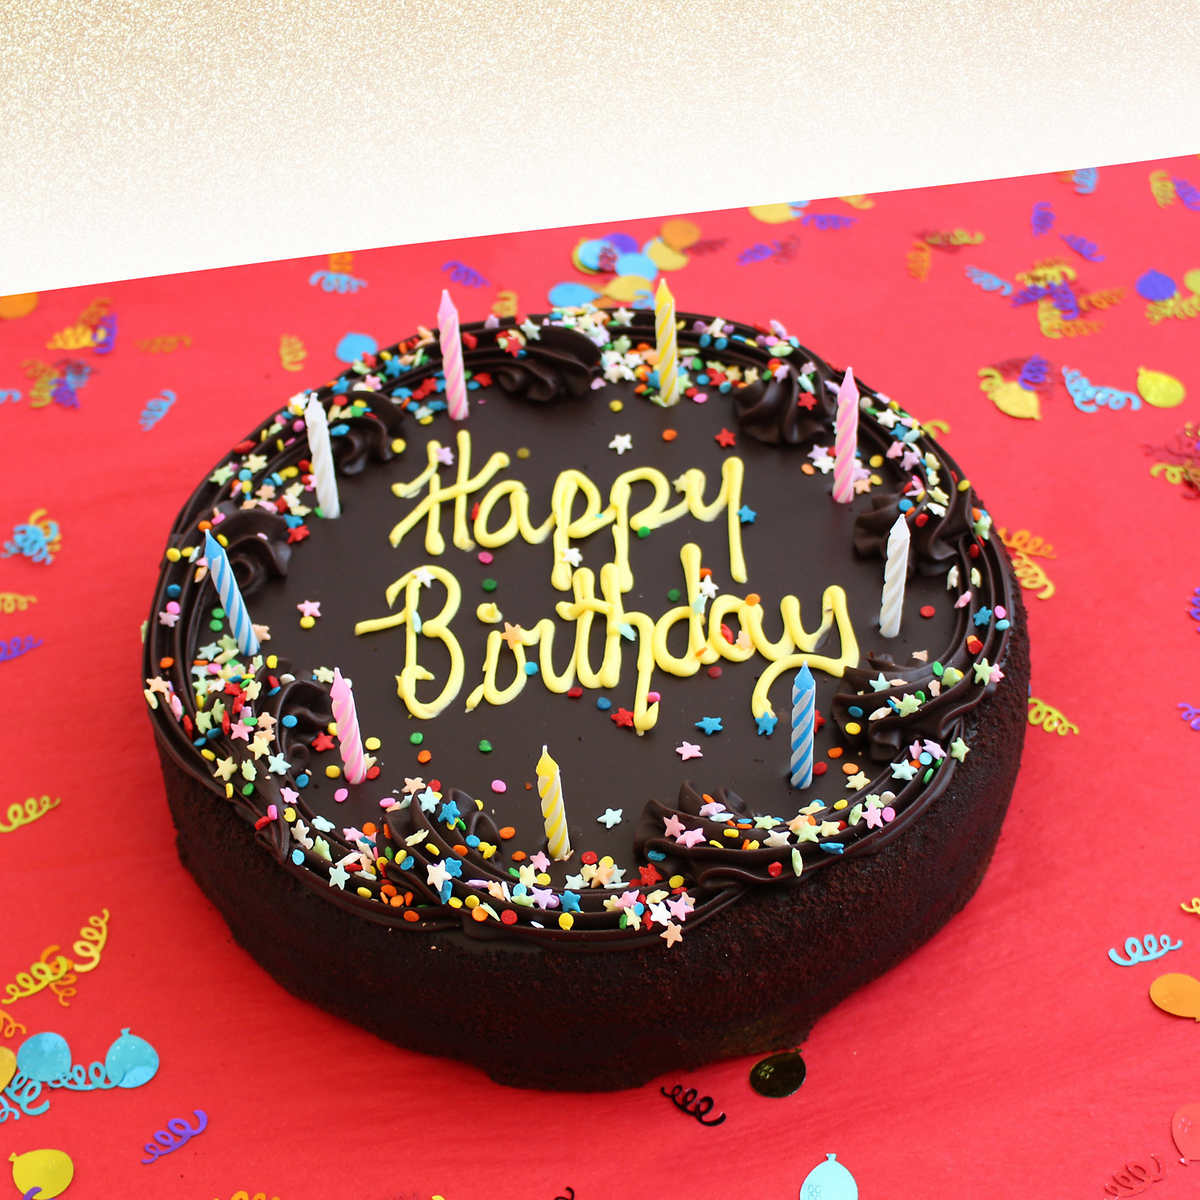 Davids Cookies Chocolate Fudge Birthday Cake 45 Lbs Includes